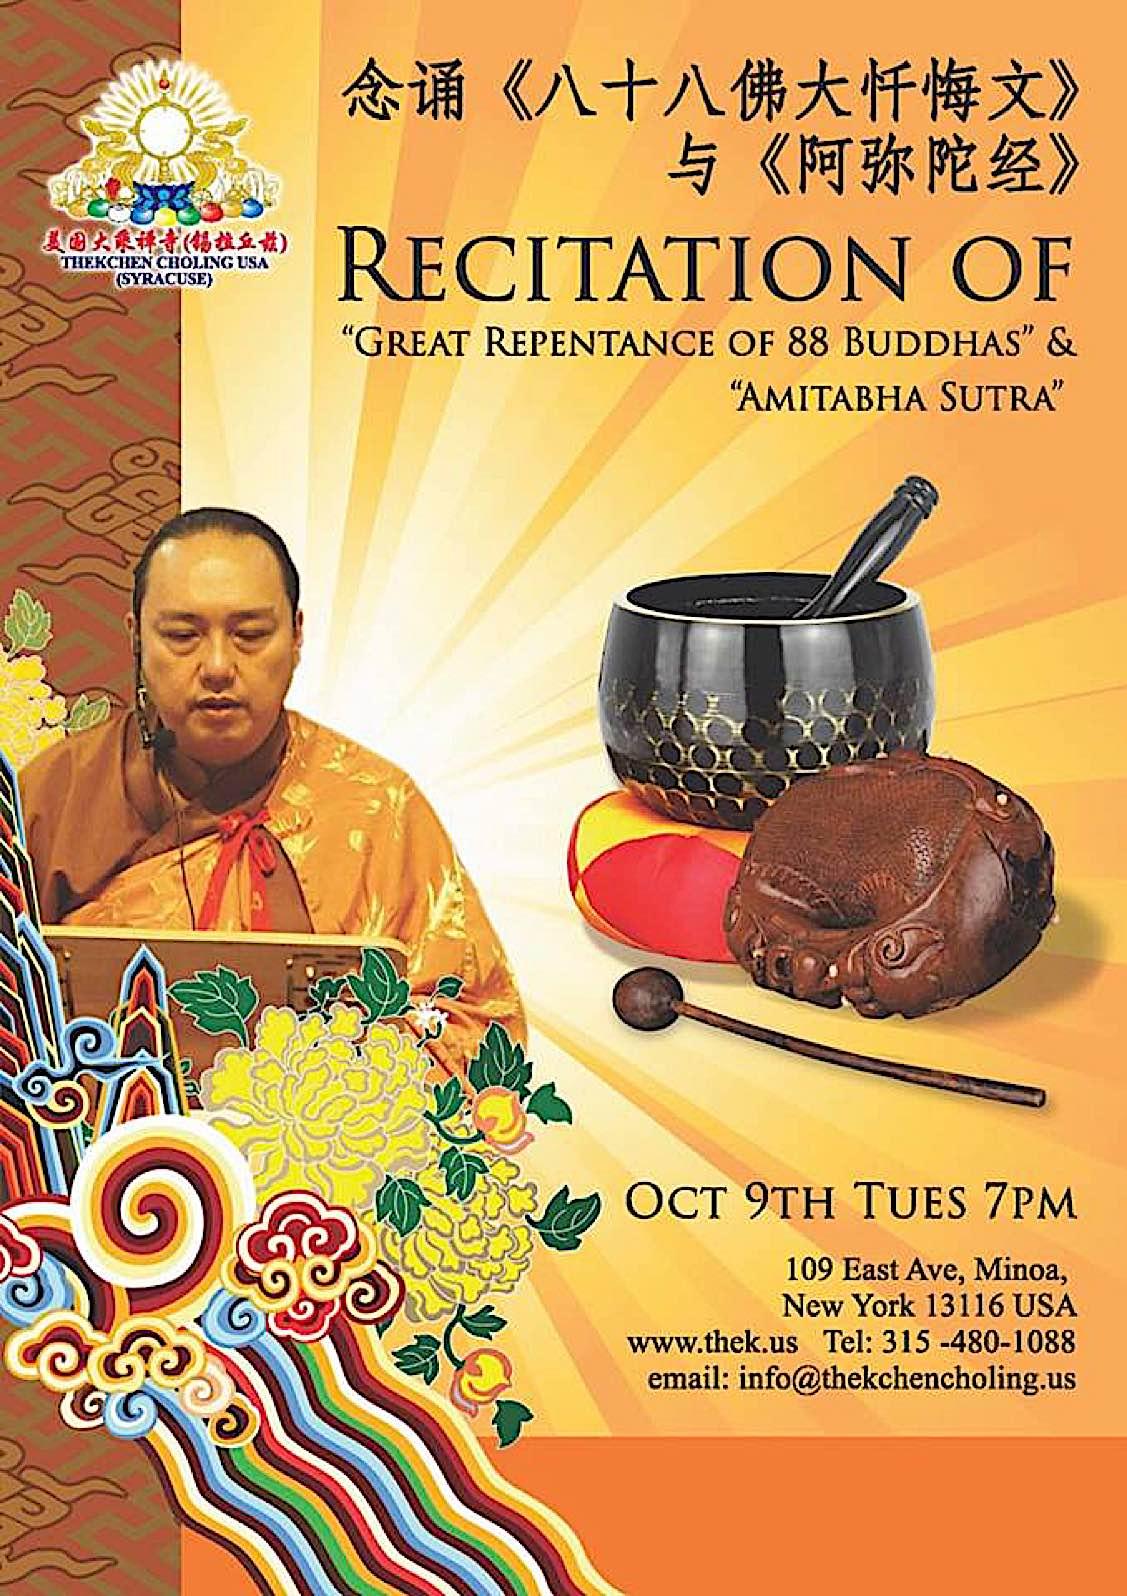 Buddha Weekly Recitation of 88 Buddhas event Buddhism